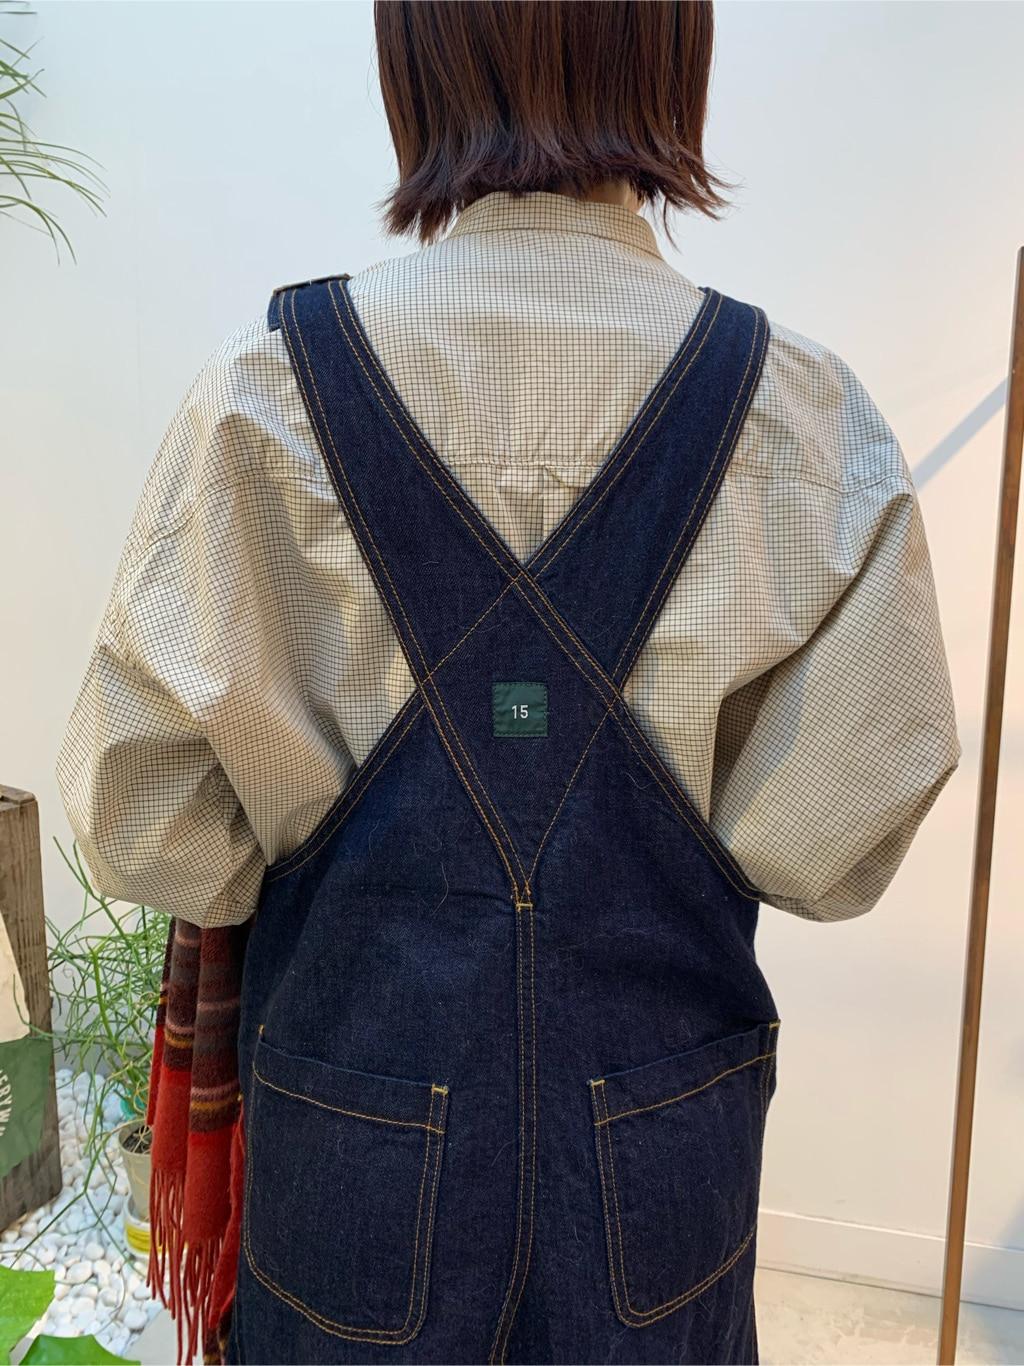 l'atelier du savon 名古屋栄路面 身長:161cm 2020.12.22